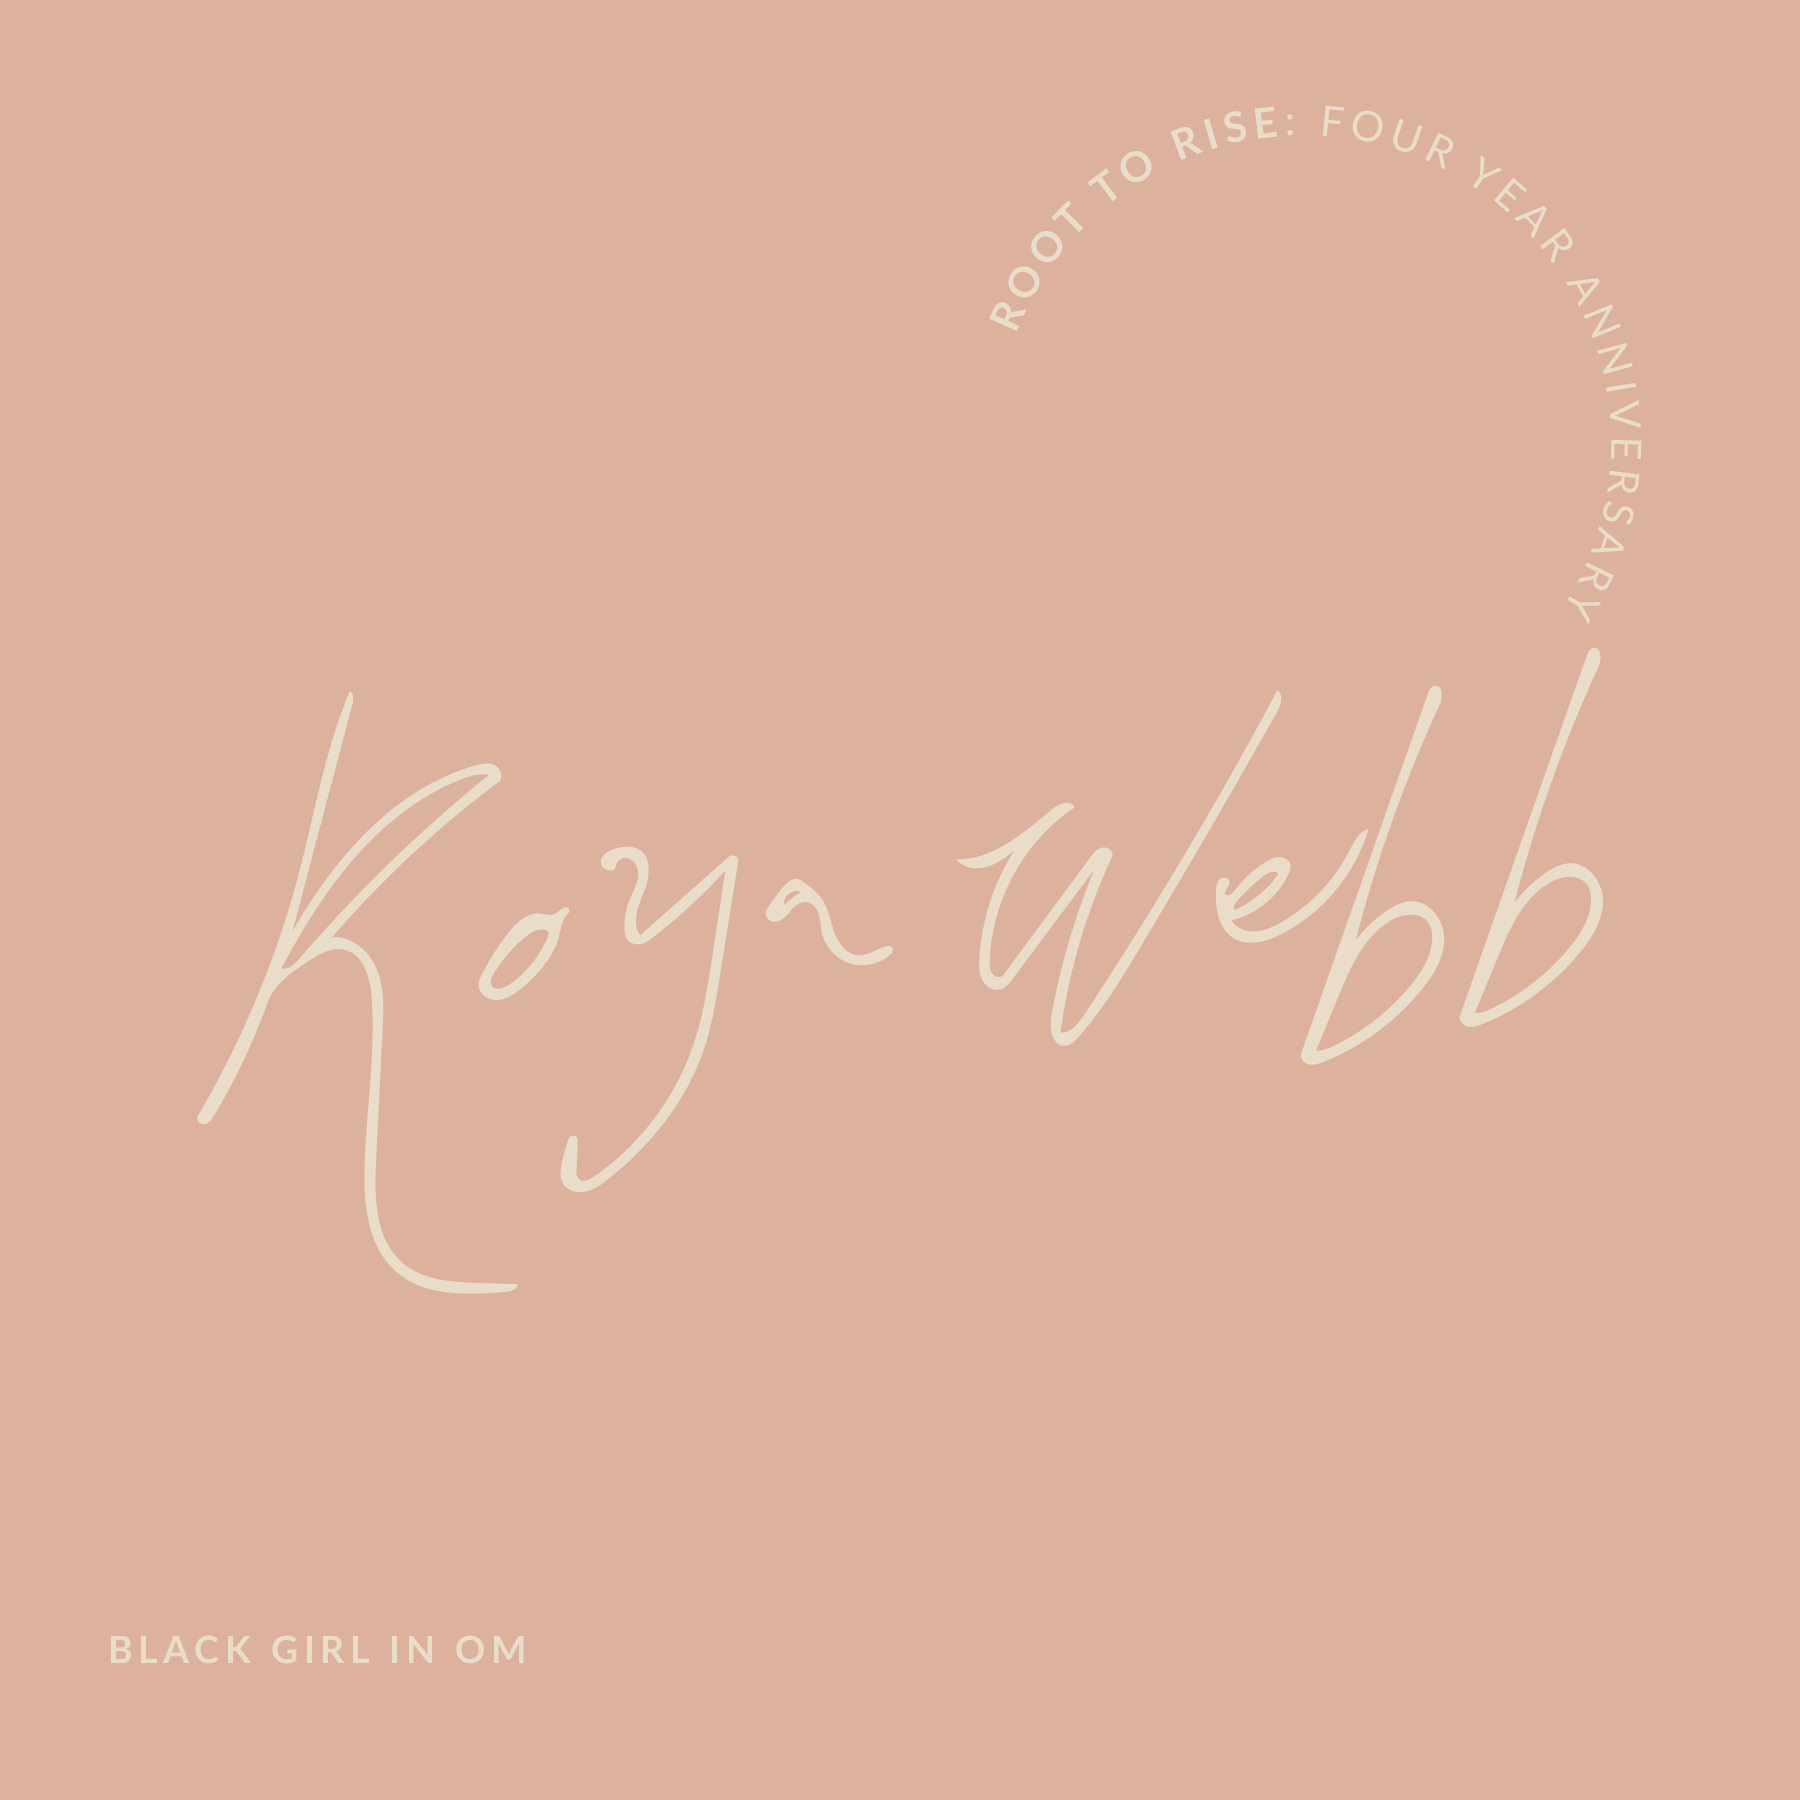 Koya Webb Root to Rise Name.jpg